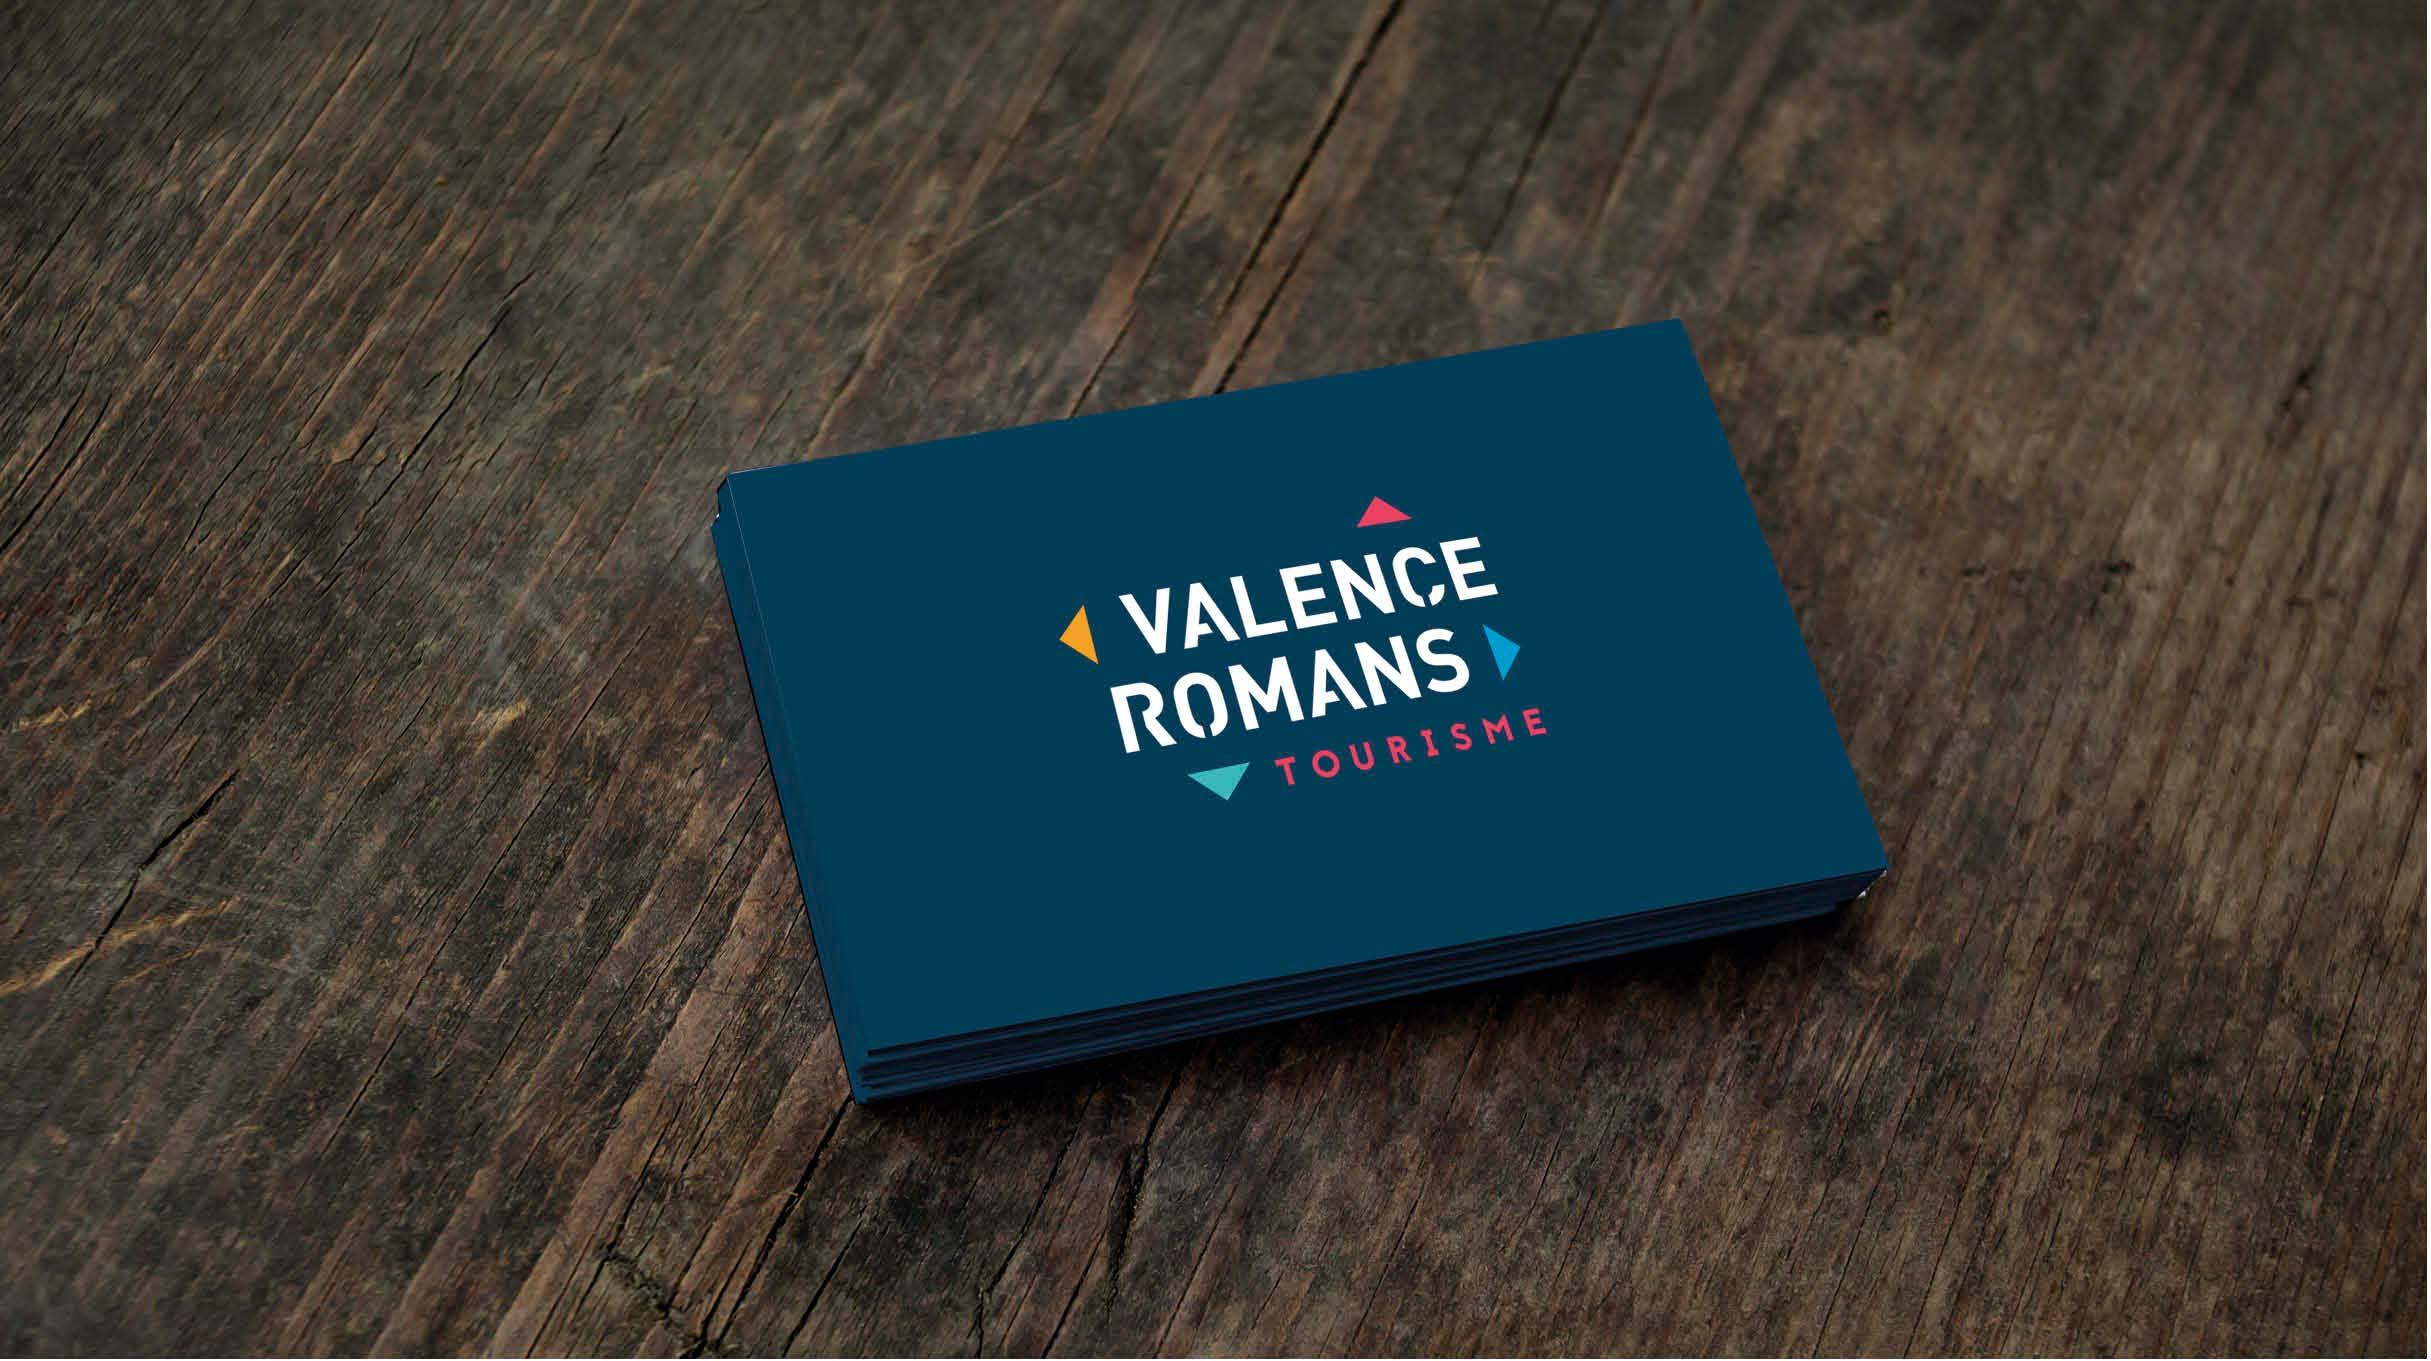 reference-valence-romans-tourisme-2